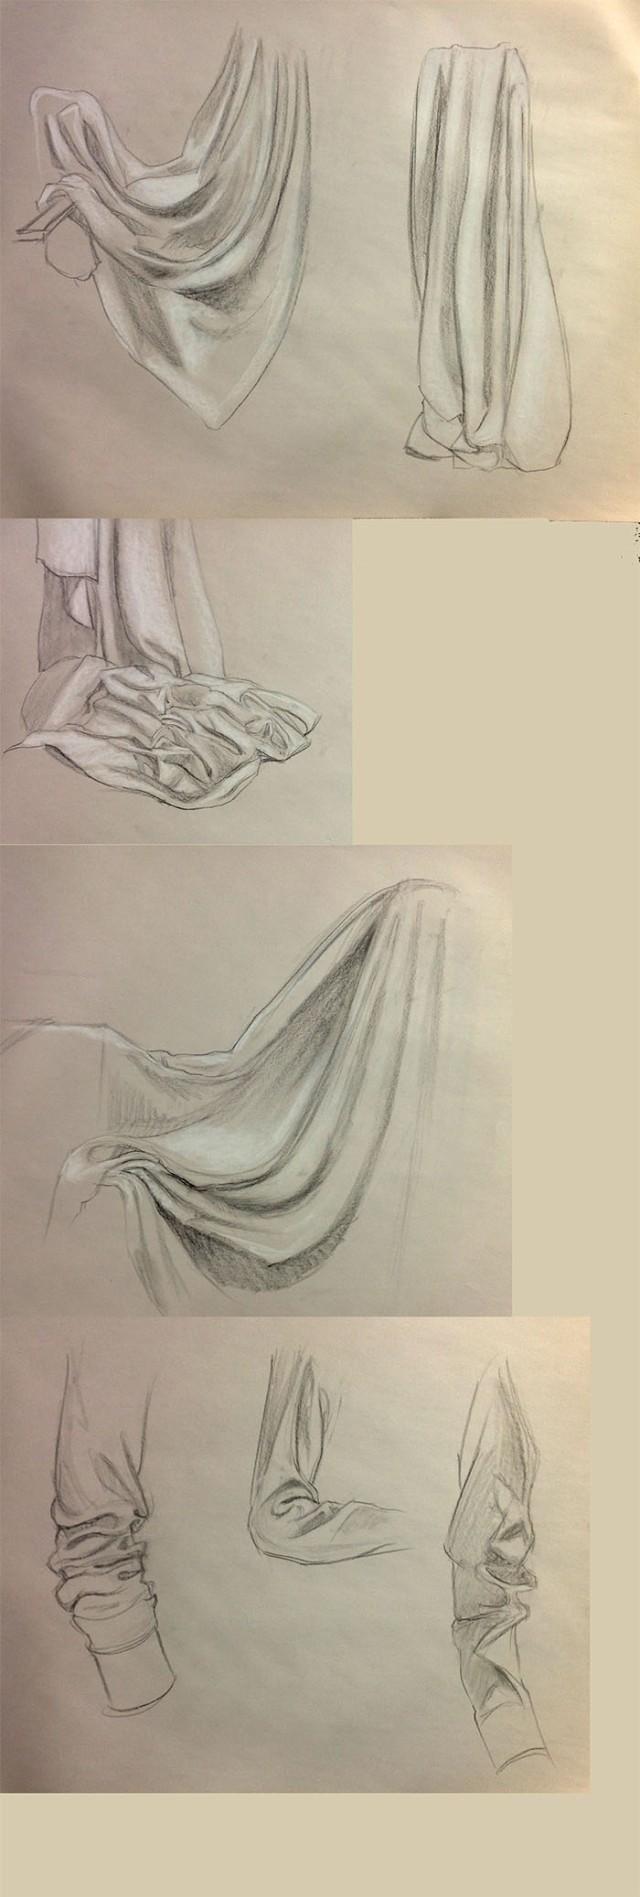 folds_wk_5